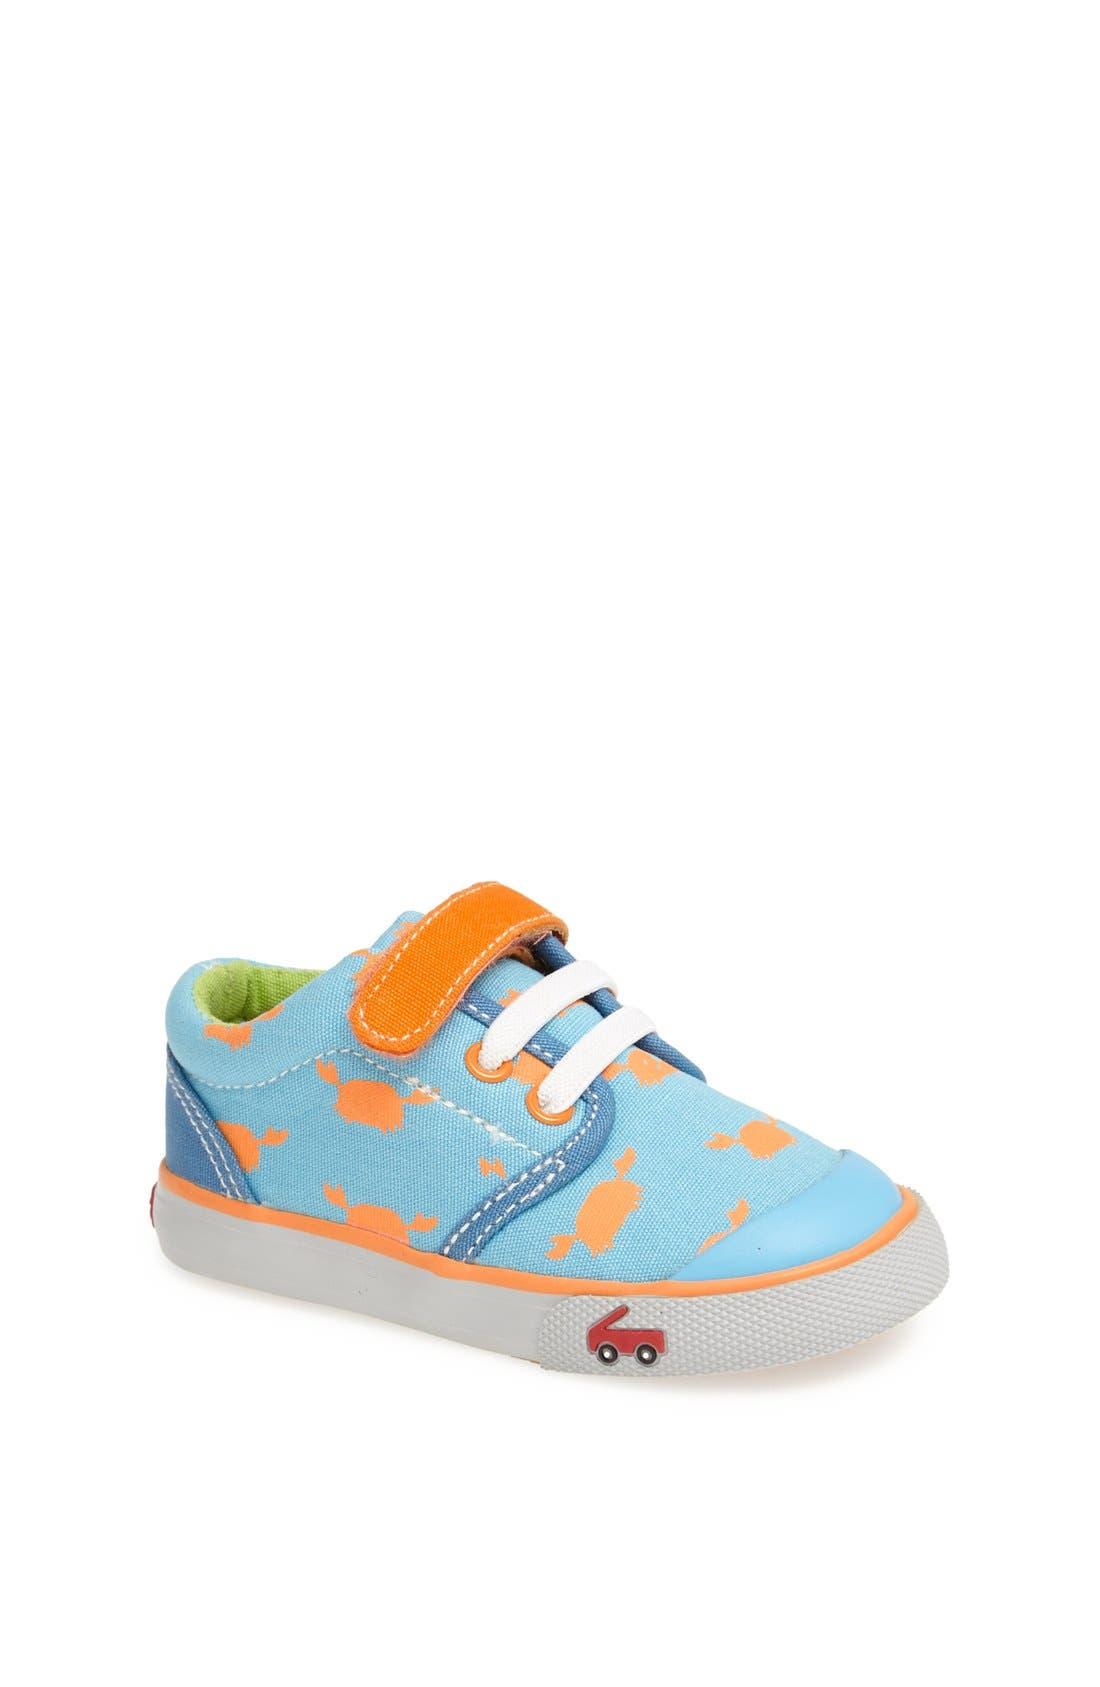 Alternate Image 1 Selected - See Kai Run 'Dieter' Sneaker (Baby, Walker & Toddler)